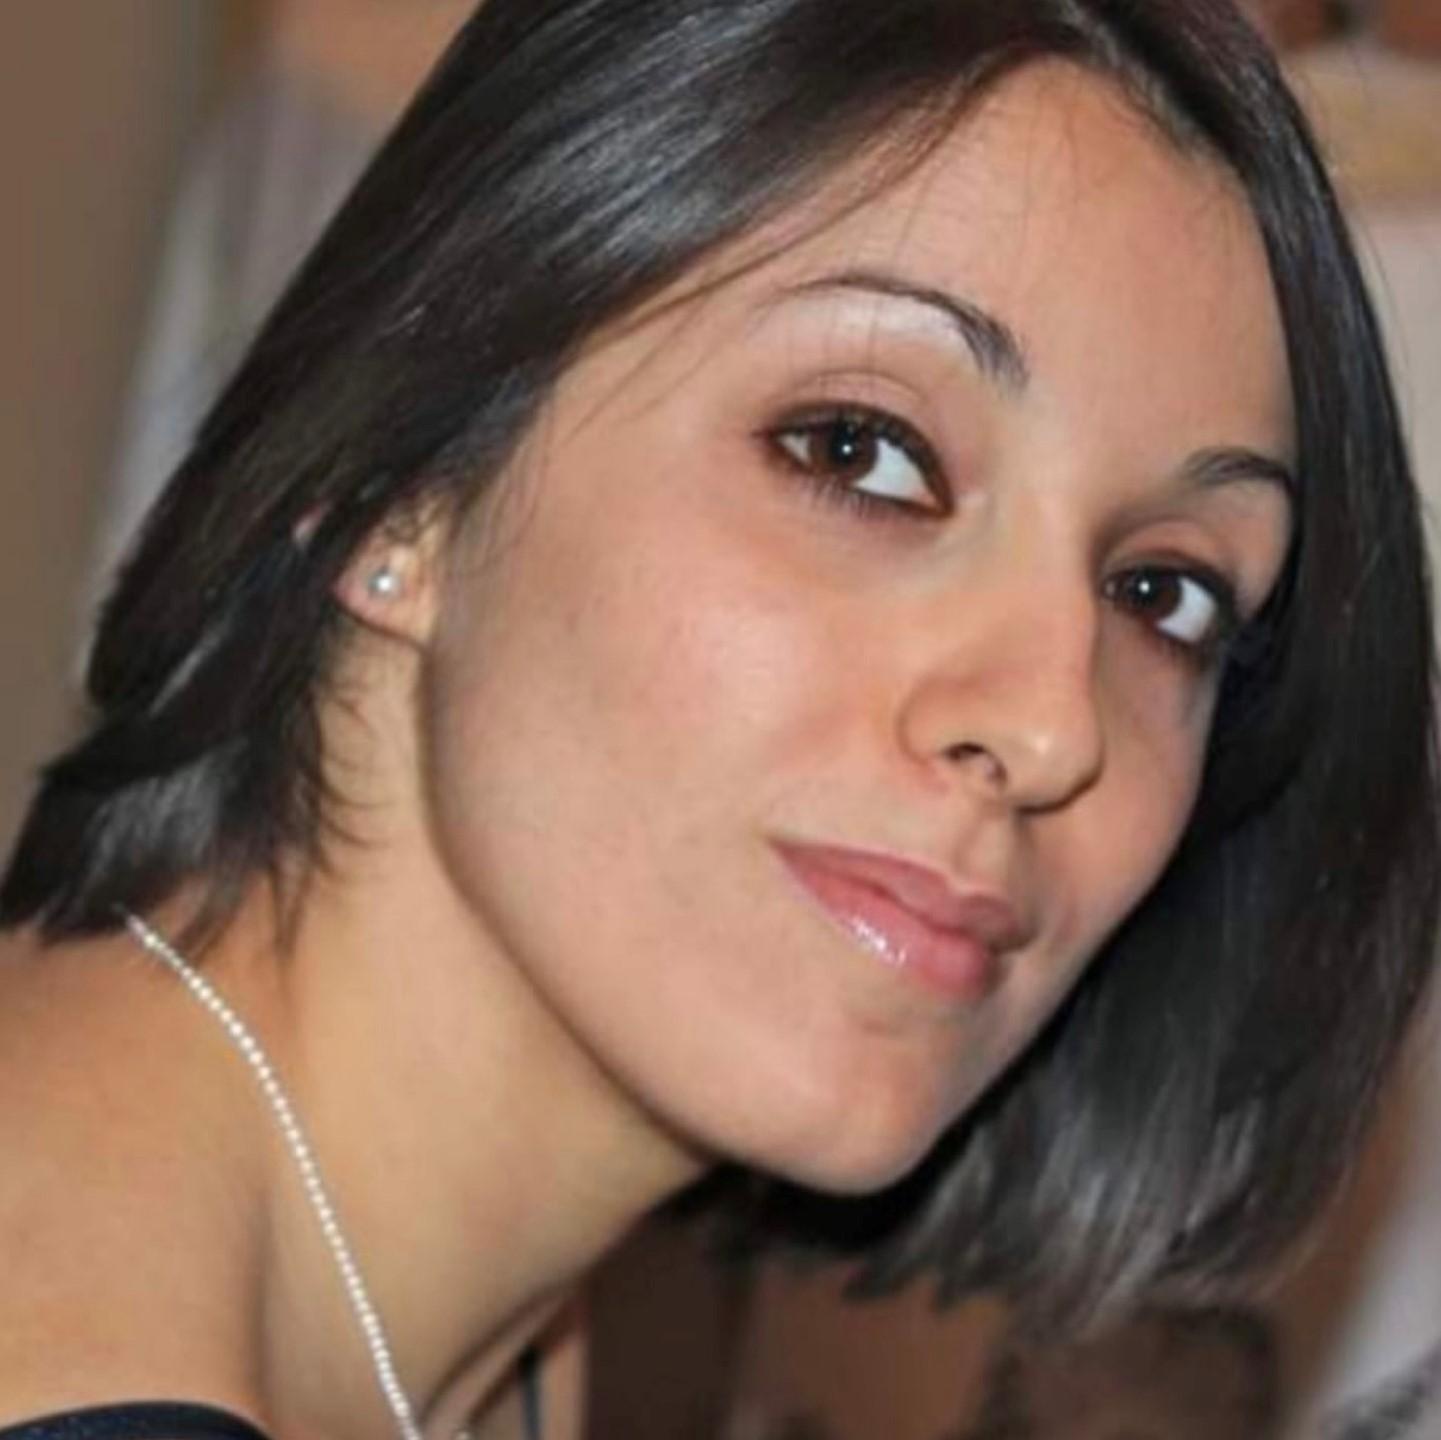 Cristiana Galatello